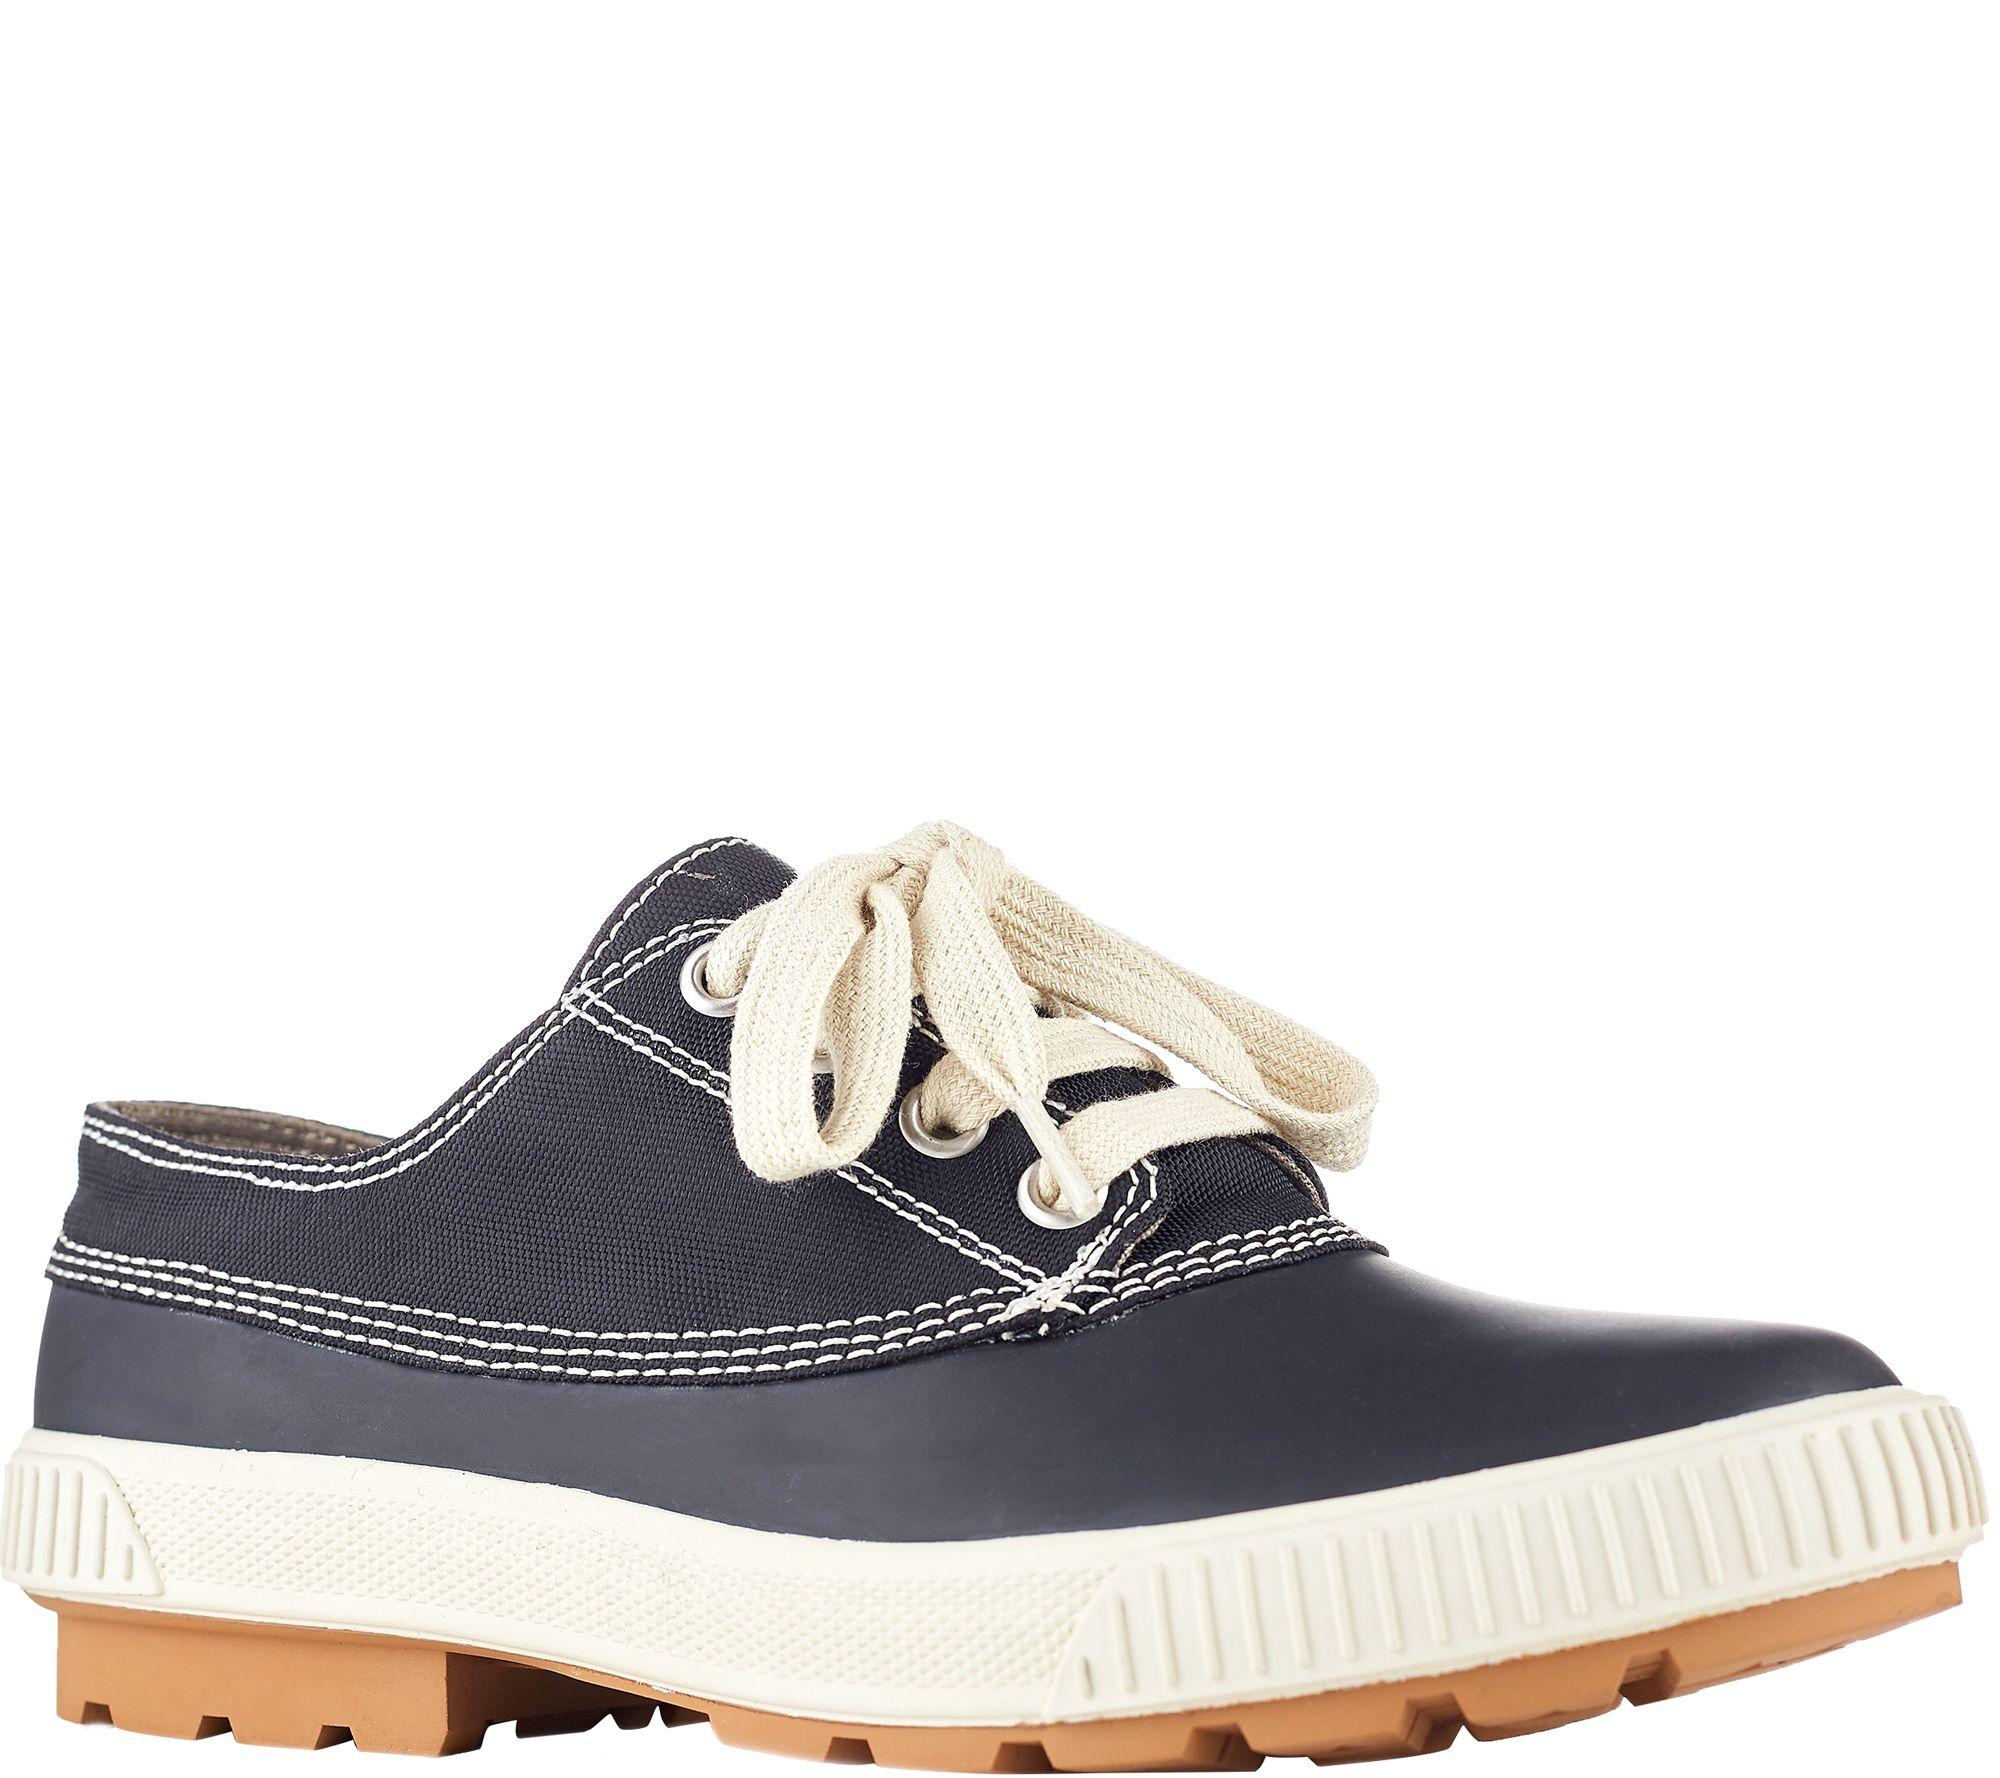 a461adf33ea3 Cougar Waterproof Duck Shoes - Dash - Page 1 — QVC.com